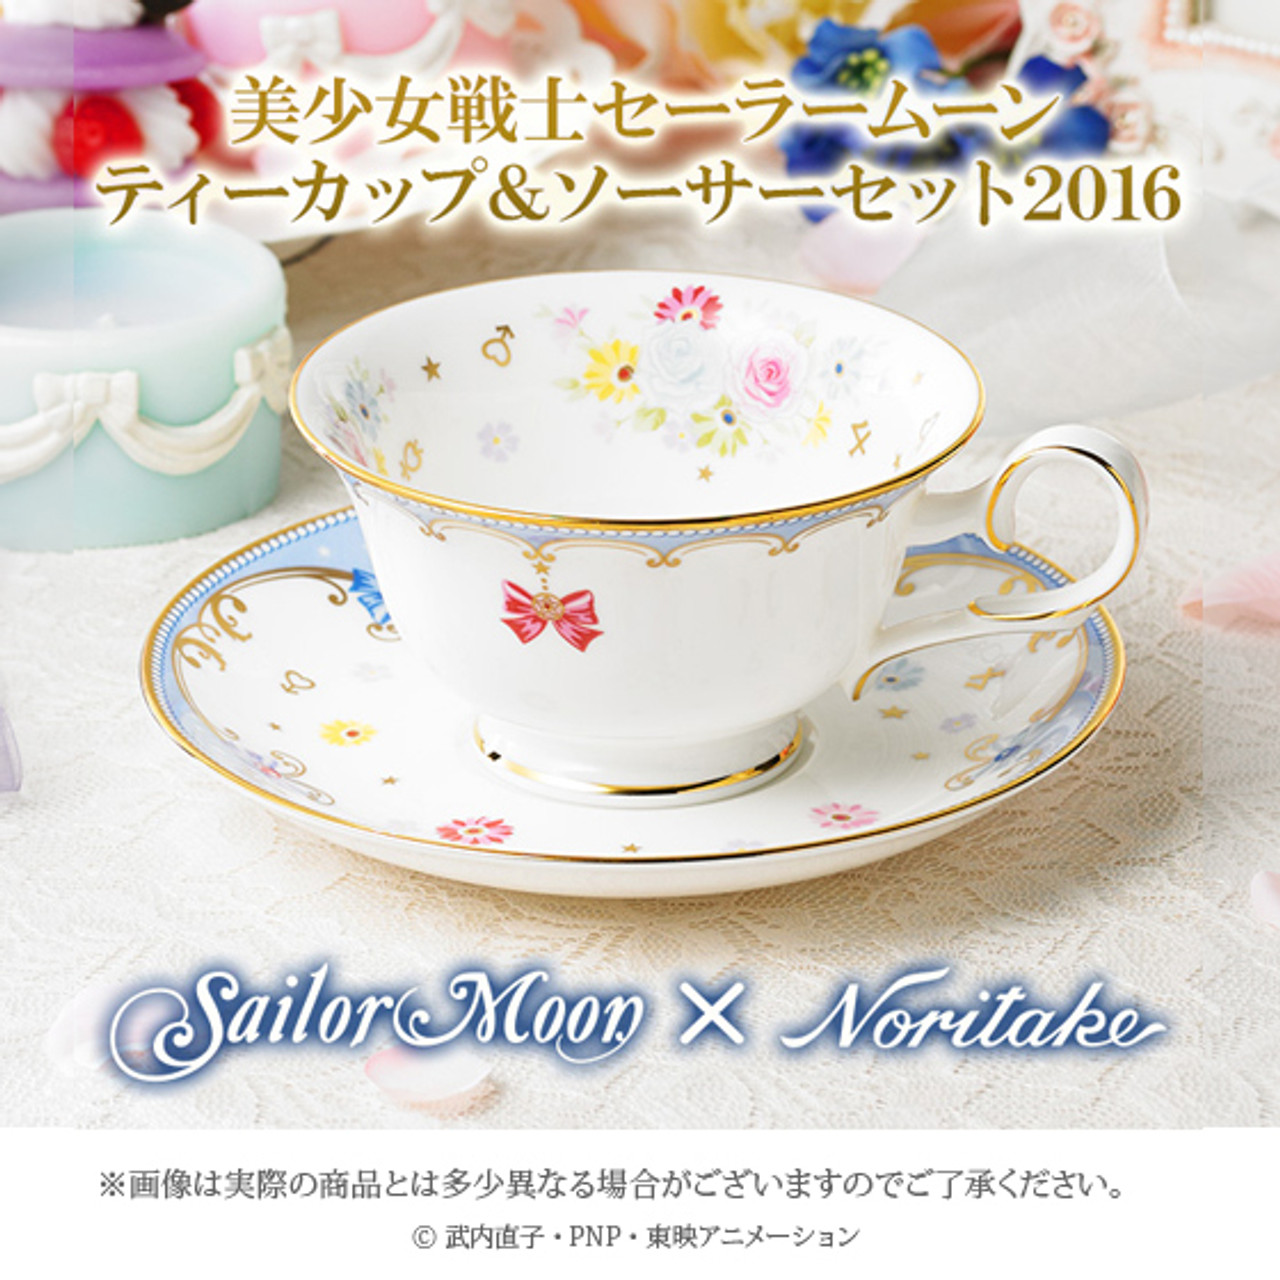 NEW Noritake x Sailor Moon Princess serenity /& prince Endymion Pair Mug SET Cup